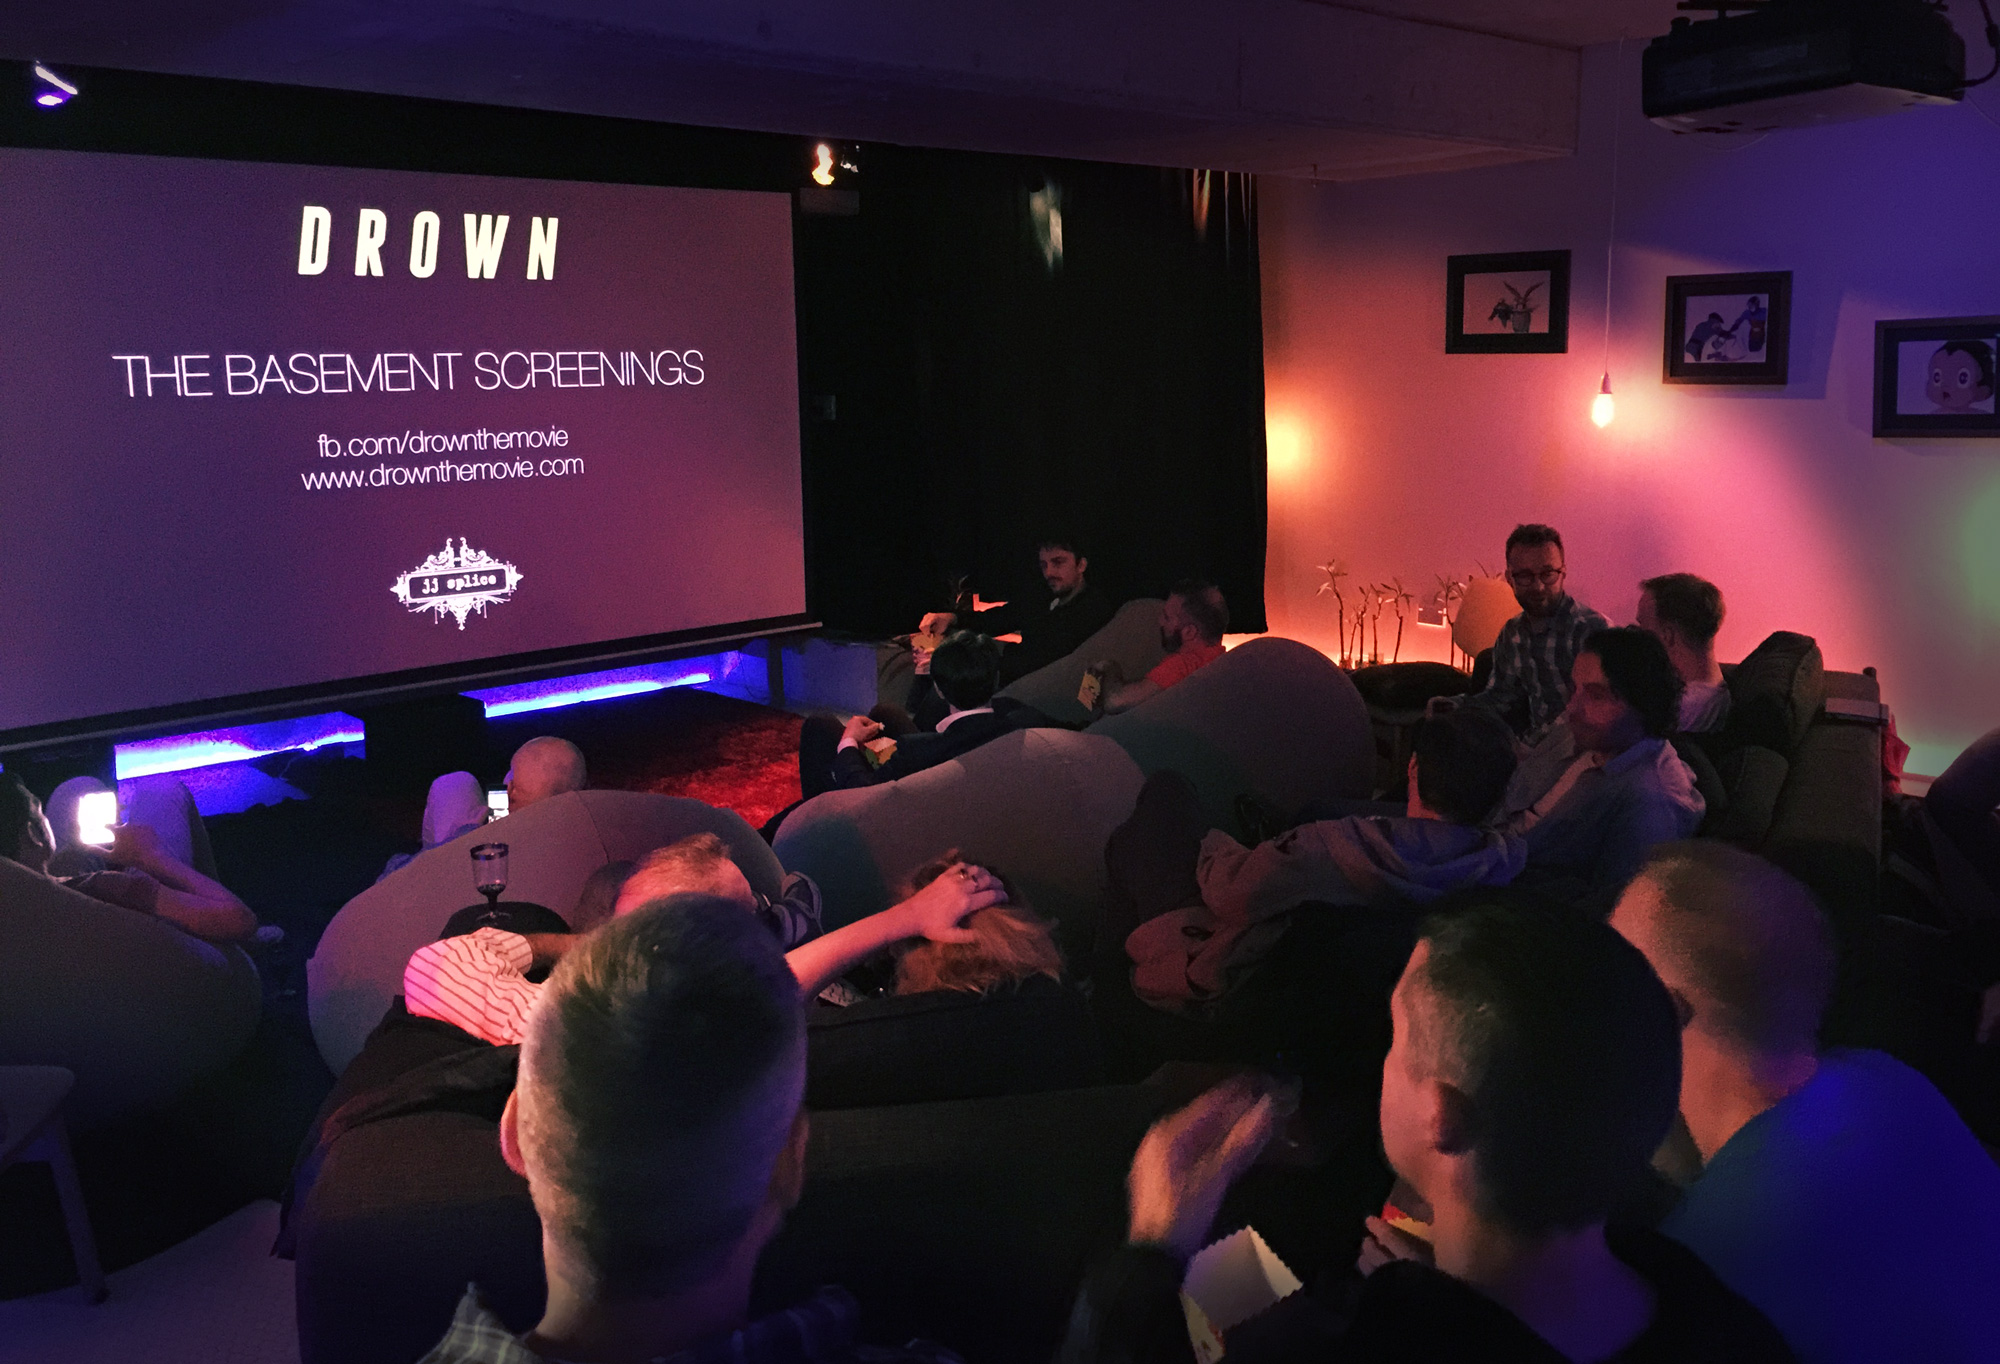 drown basement screenings